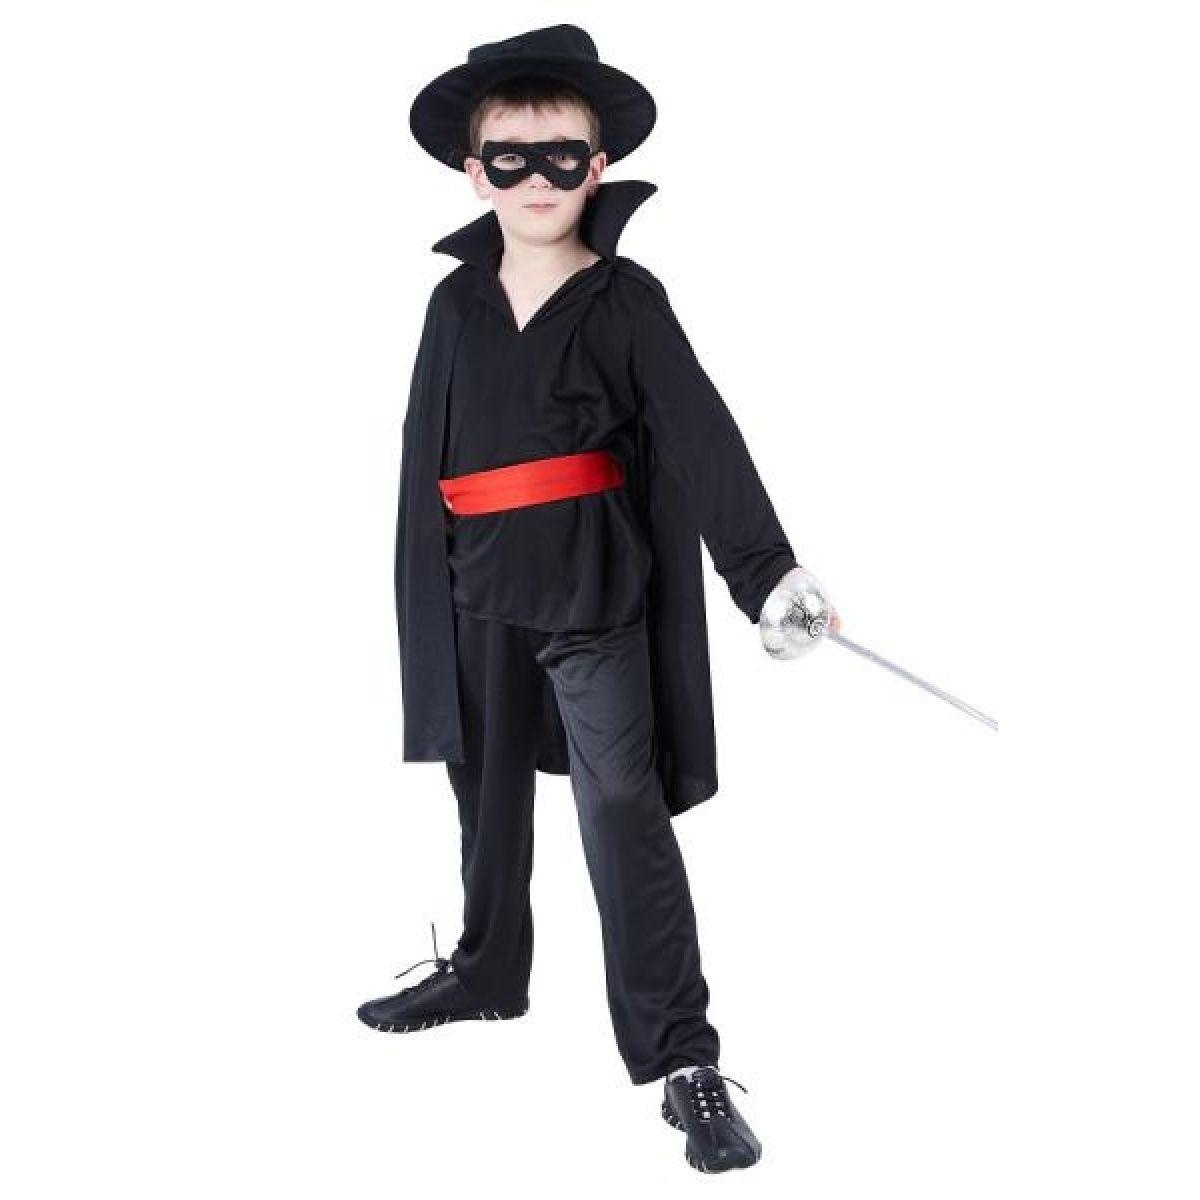 Made Detský kostým Bandita 110-120 cm